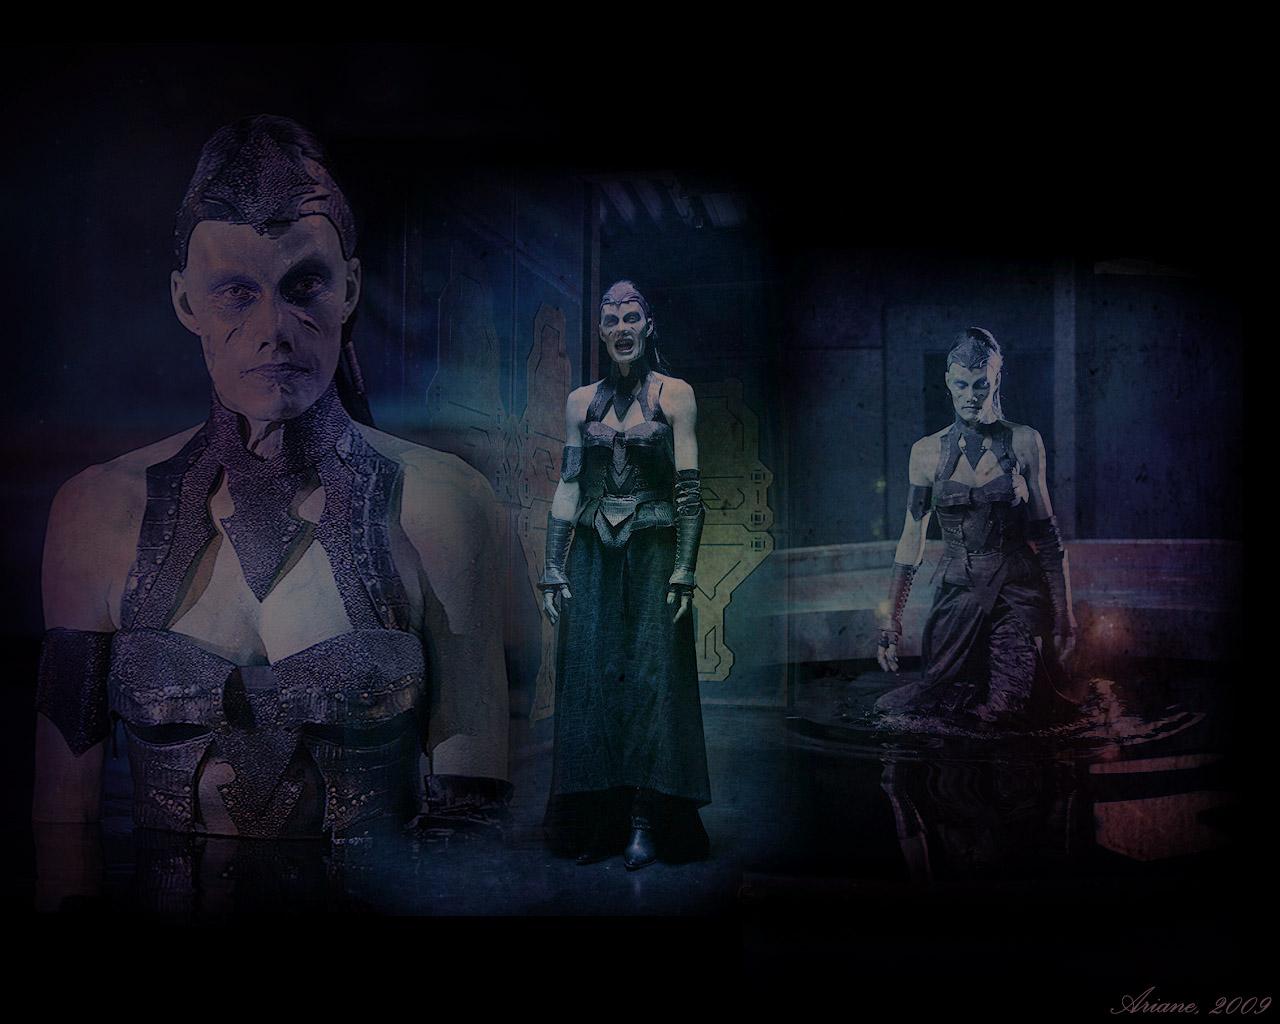 FS19 Halo Covenant Wraith v 2.0 - FarmingSimulator.NET  |Covenant Wraith Purple